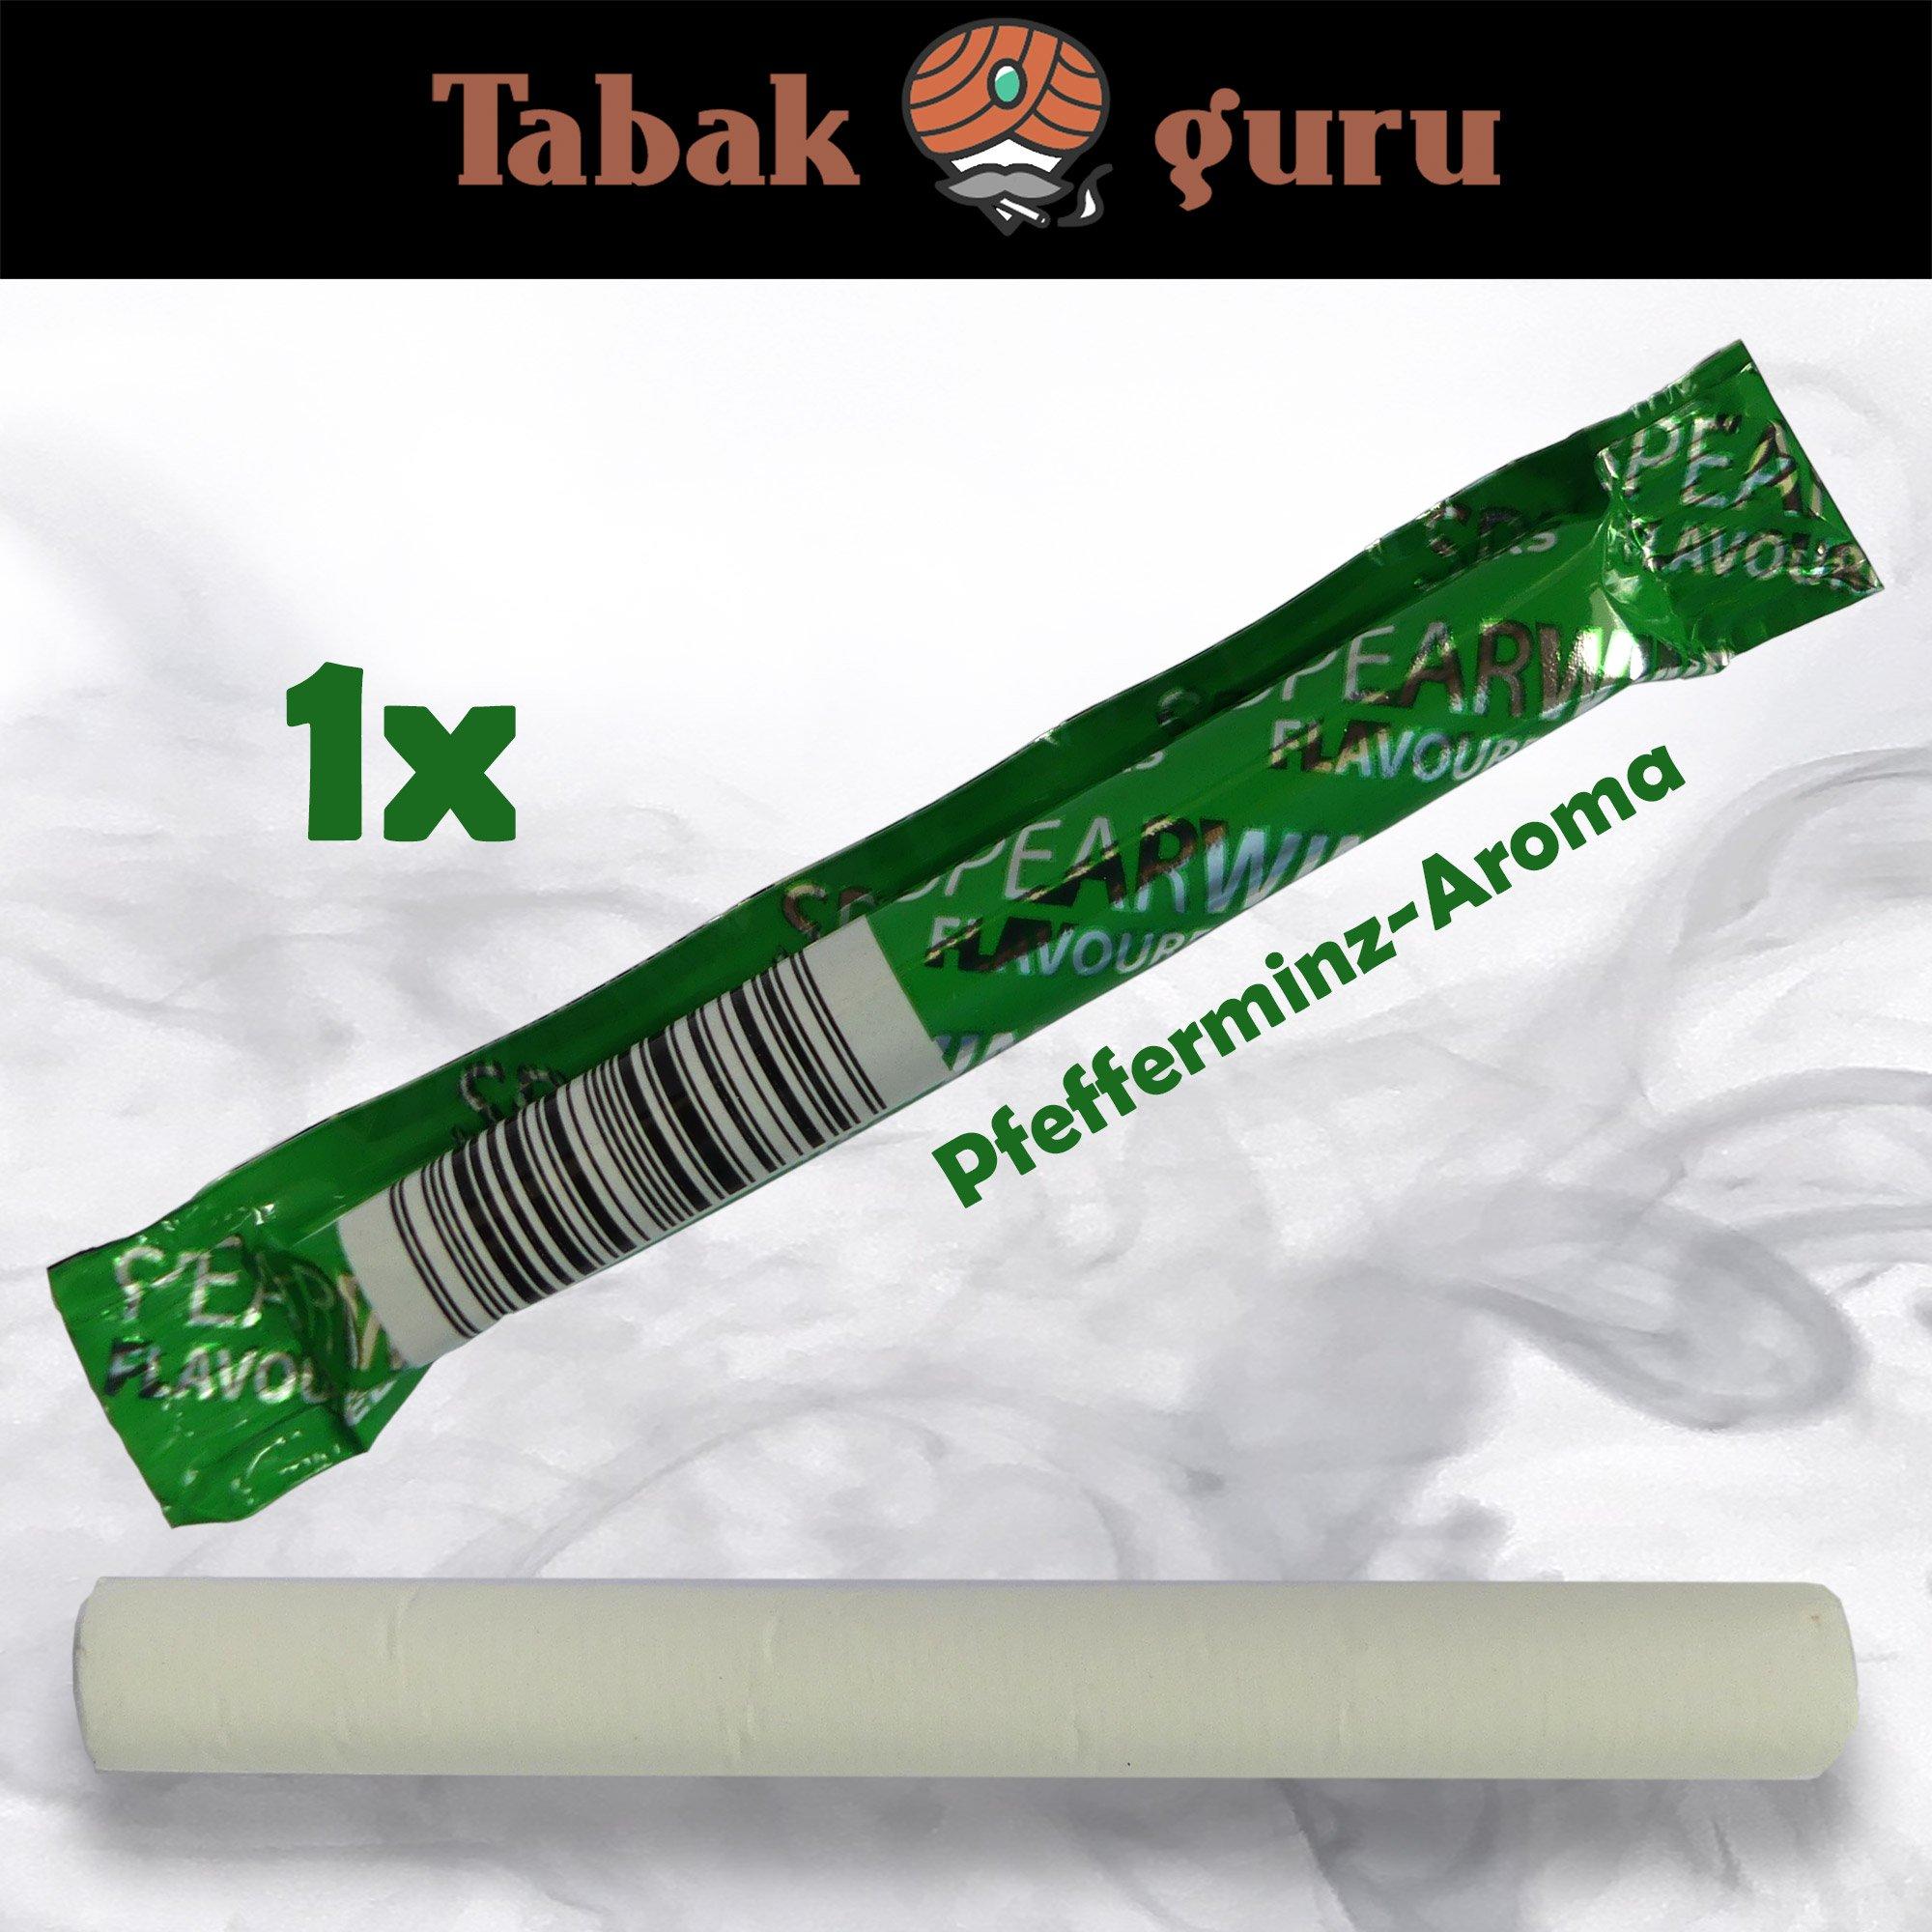 SPEARWIND MINT Pfefferminz-Aroma für Zigaretten & Tabak - Aroma-Stick